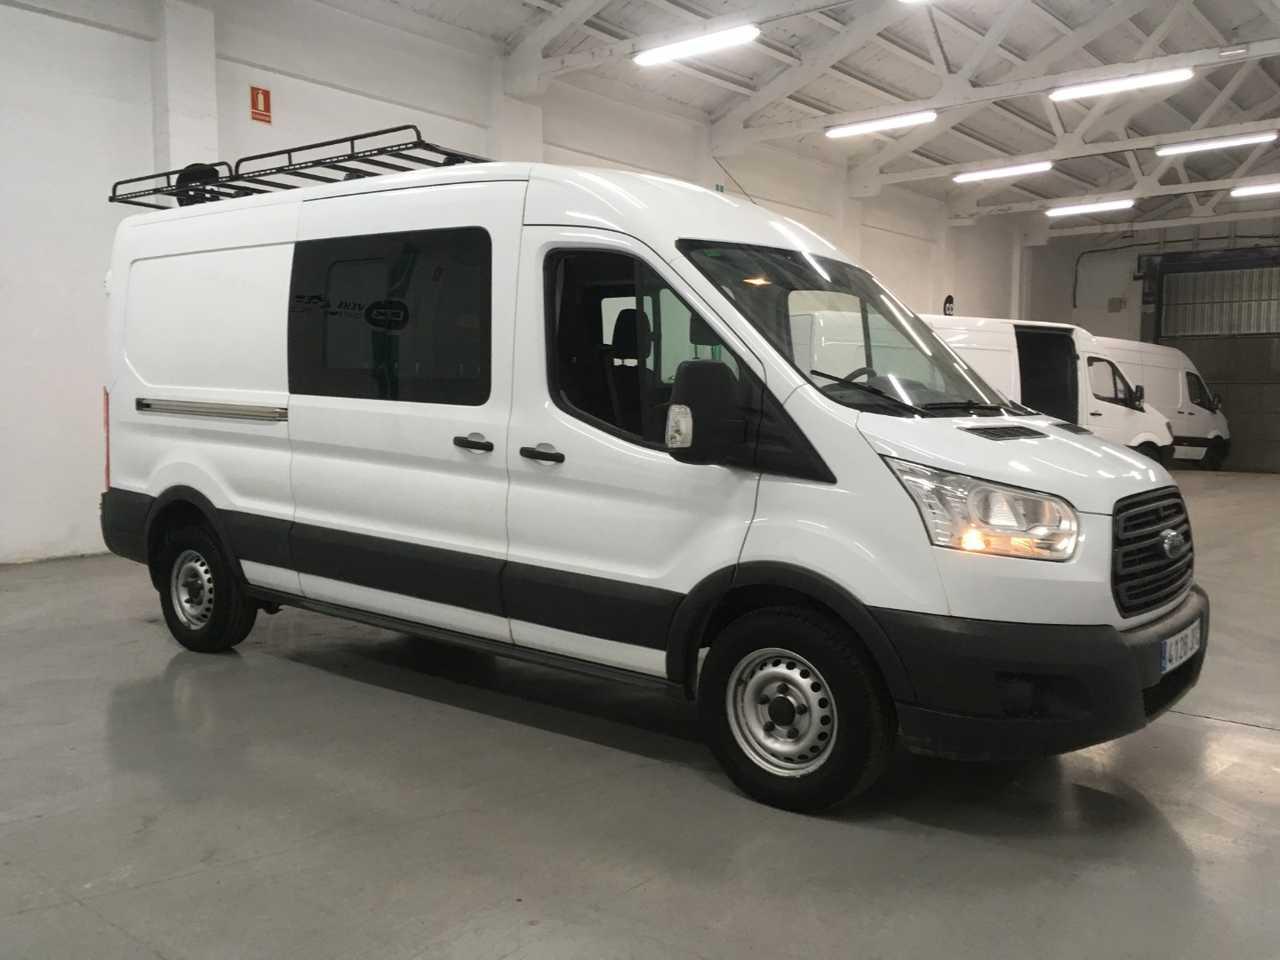 Ford Transit  Minibus y Kombi 7 Plazas FT 350 L3H2 2.2 TDCI 125cv + Separador de carga   - Foto 1